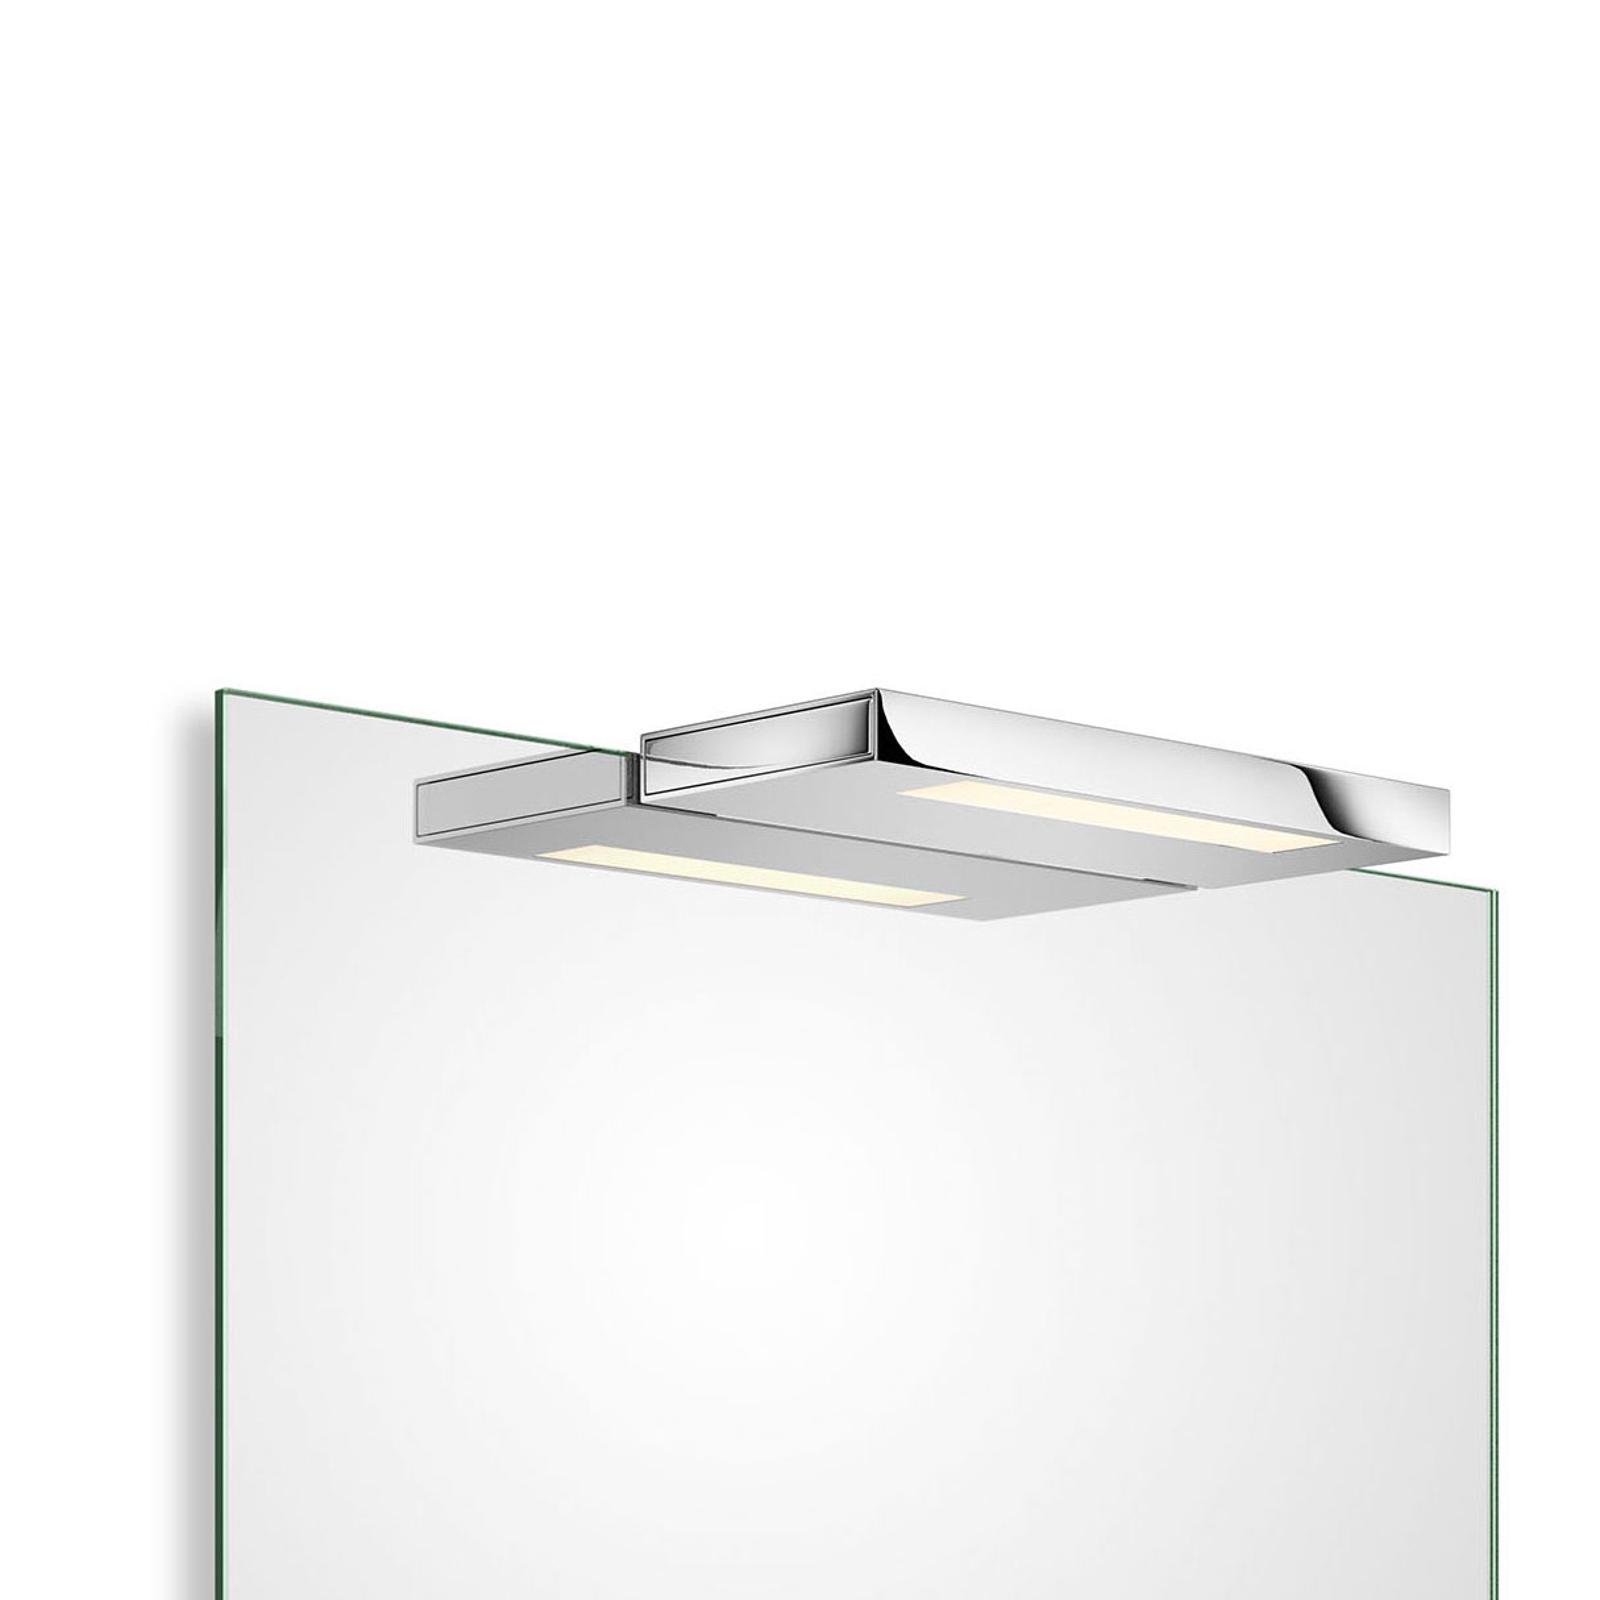 Decor Walther Slim 1-24 N LED-lampe, 24 cm, krom